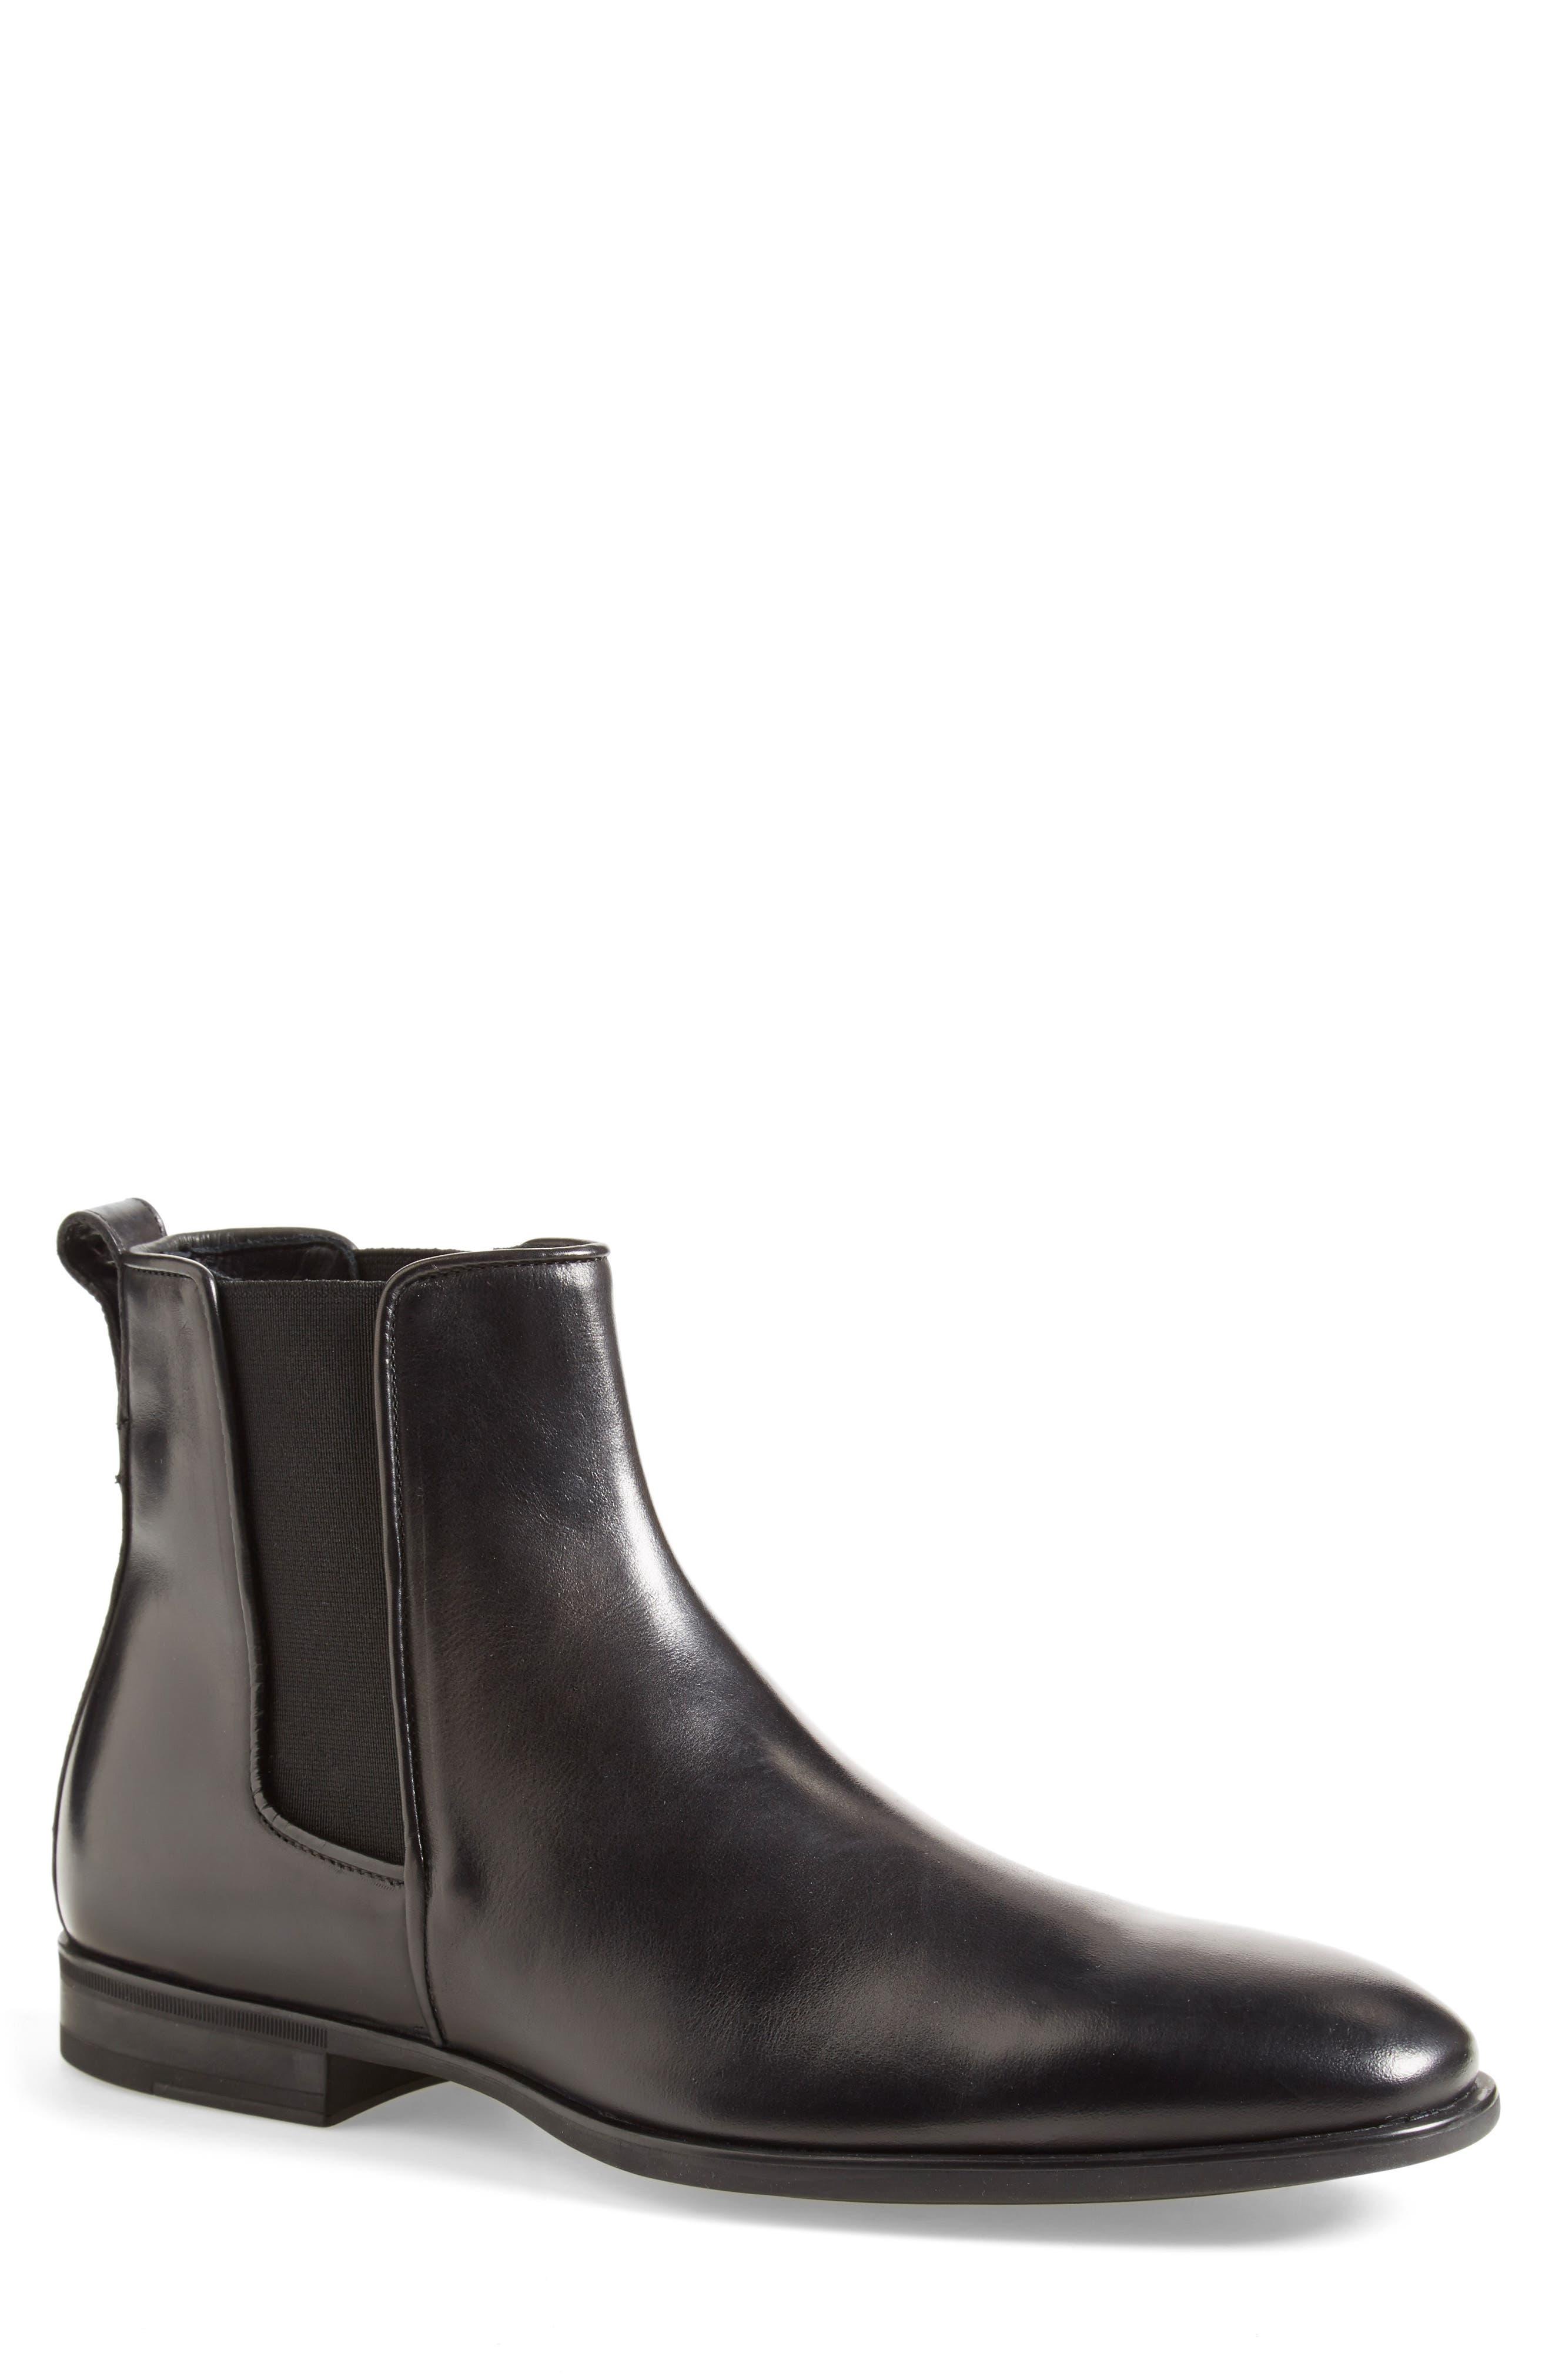 AQUATALIA, 'Adrian' Water Resistant Chelsea Boot, Alternate thumbnail 7, color, BLACK/ BLACK